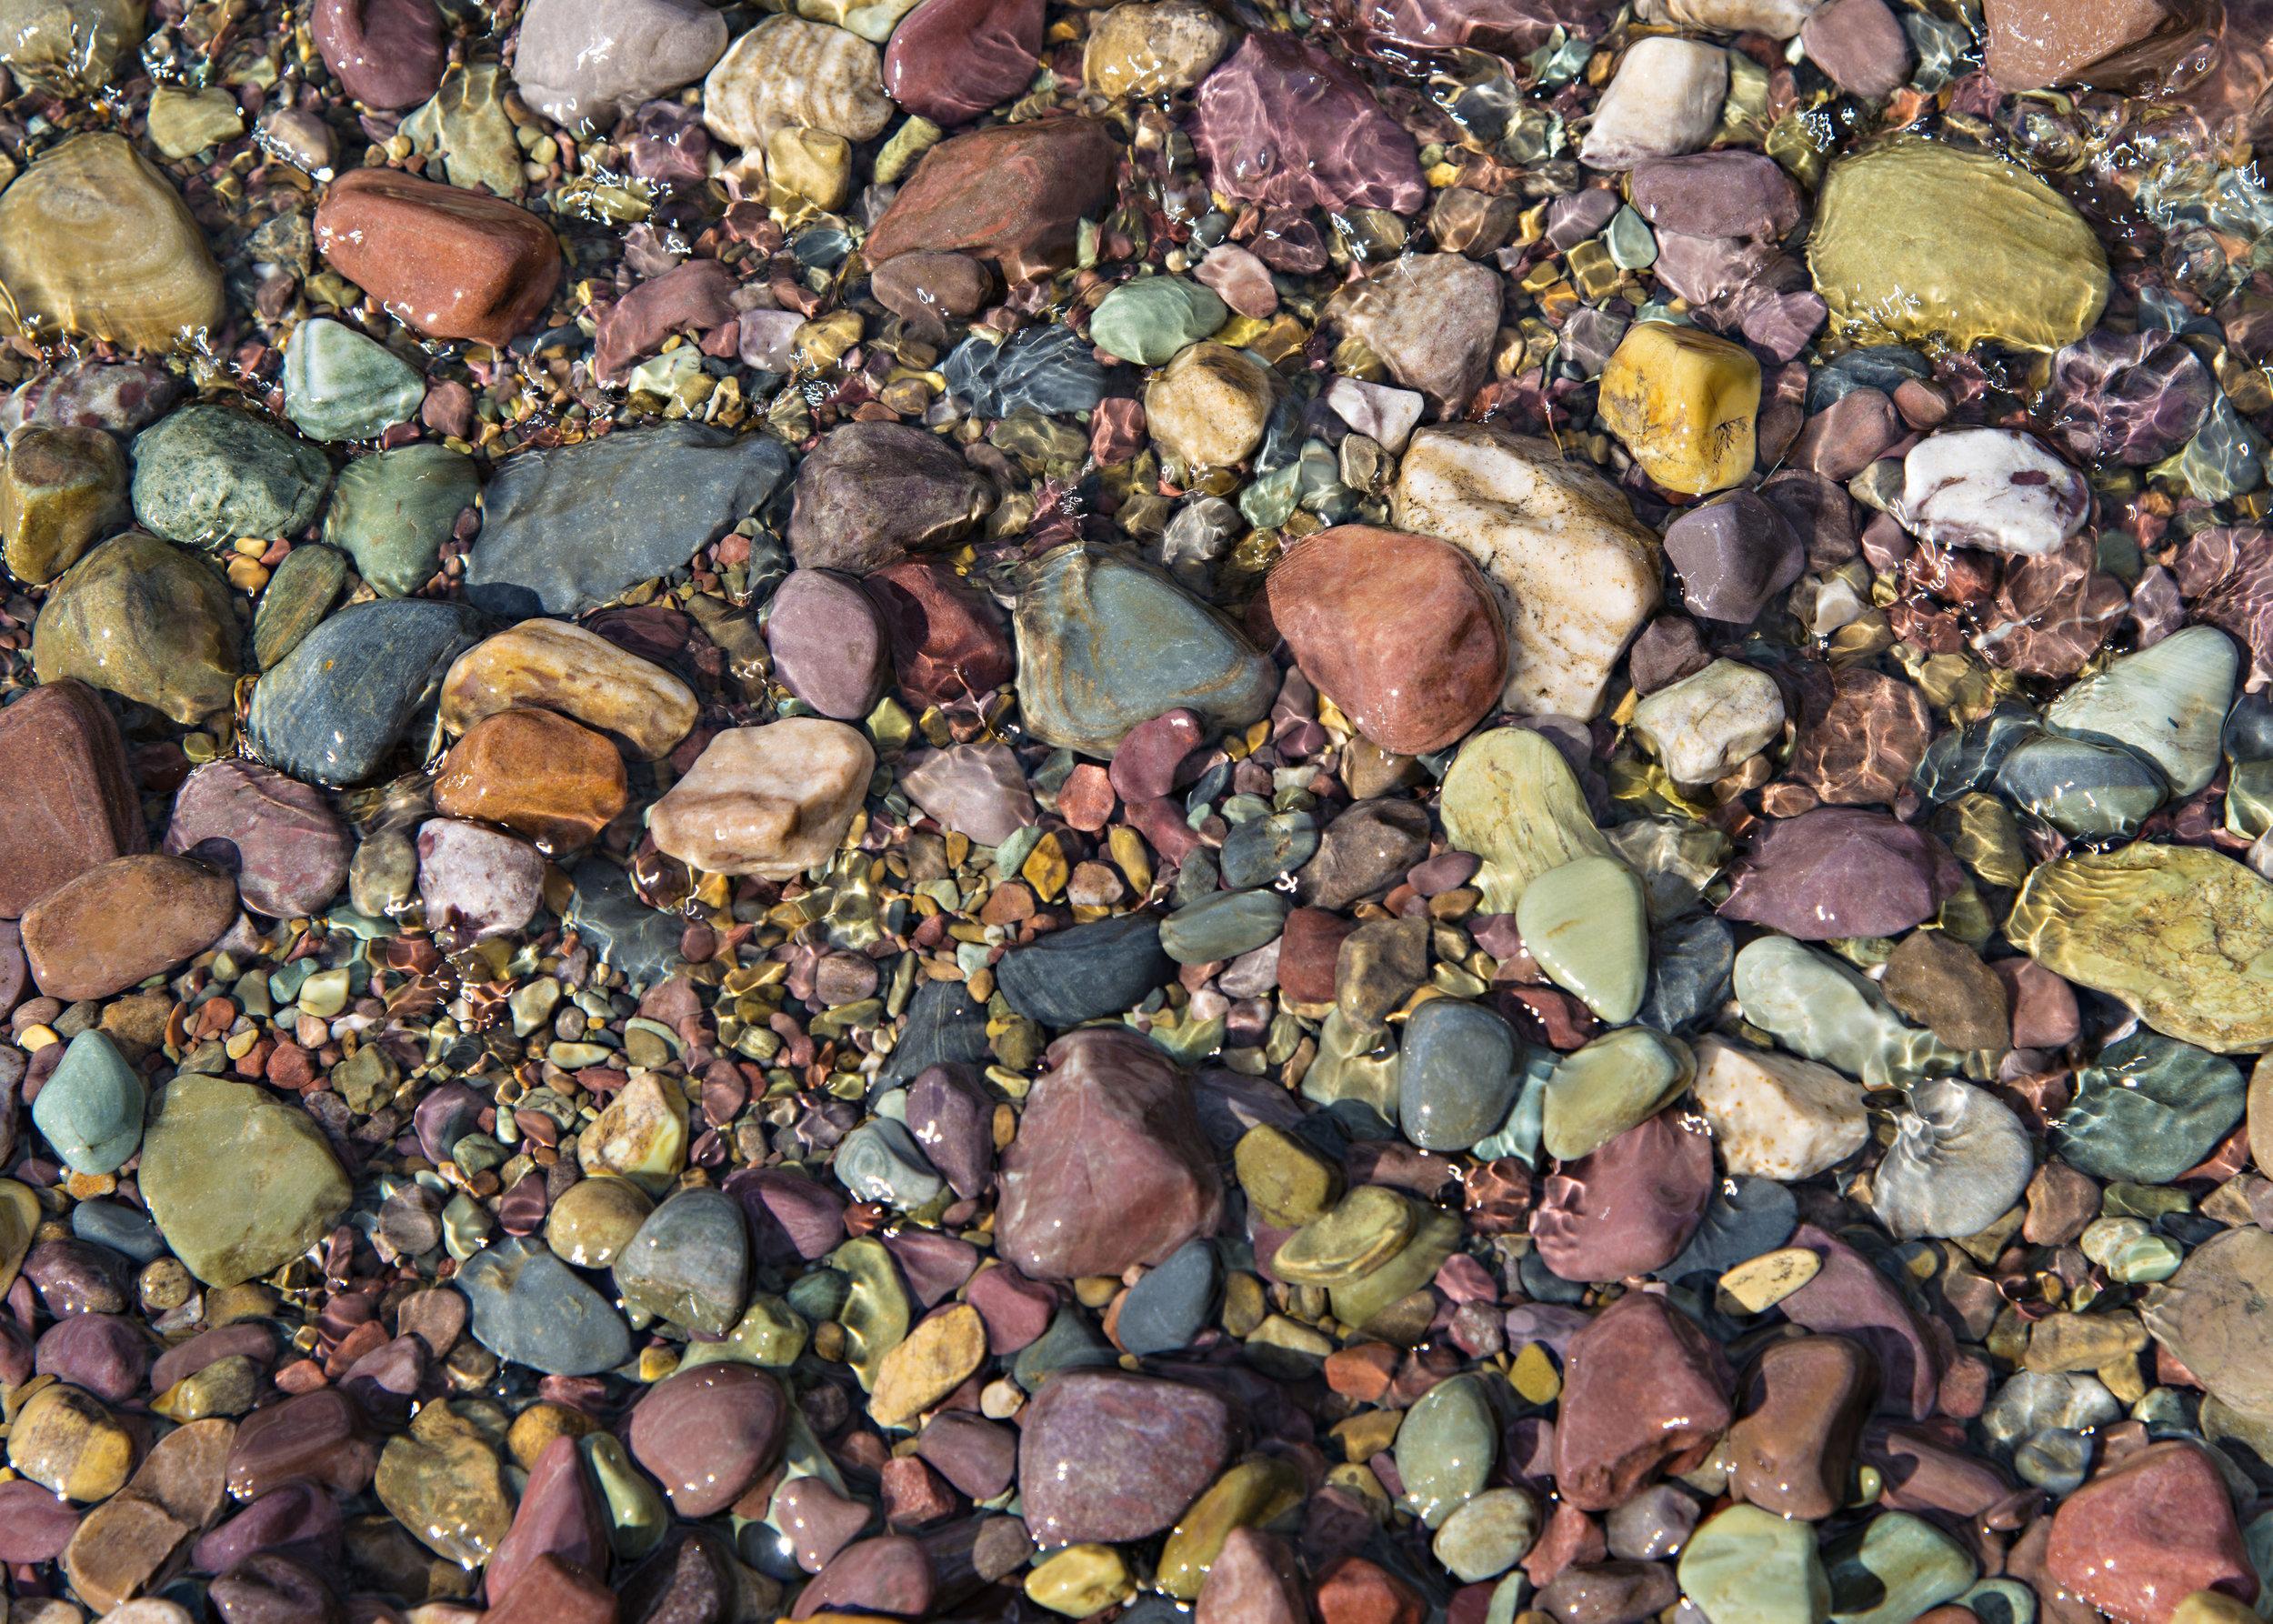 Stones along the shore of Lake McDonald, Glacier National Park. Nikon D800, Nikkor 24-120mm lens @ 86m, ISO 100, f8, 1/160 sec.